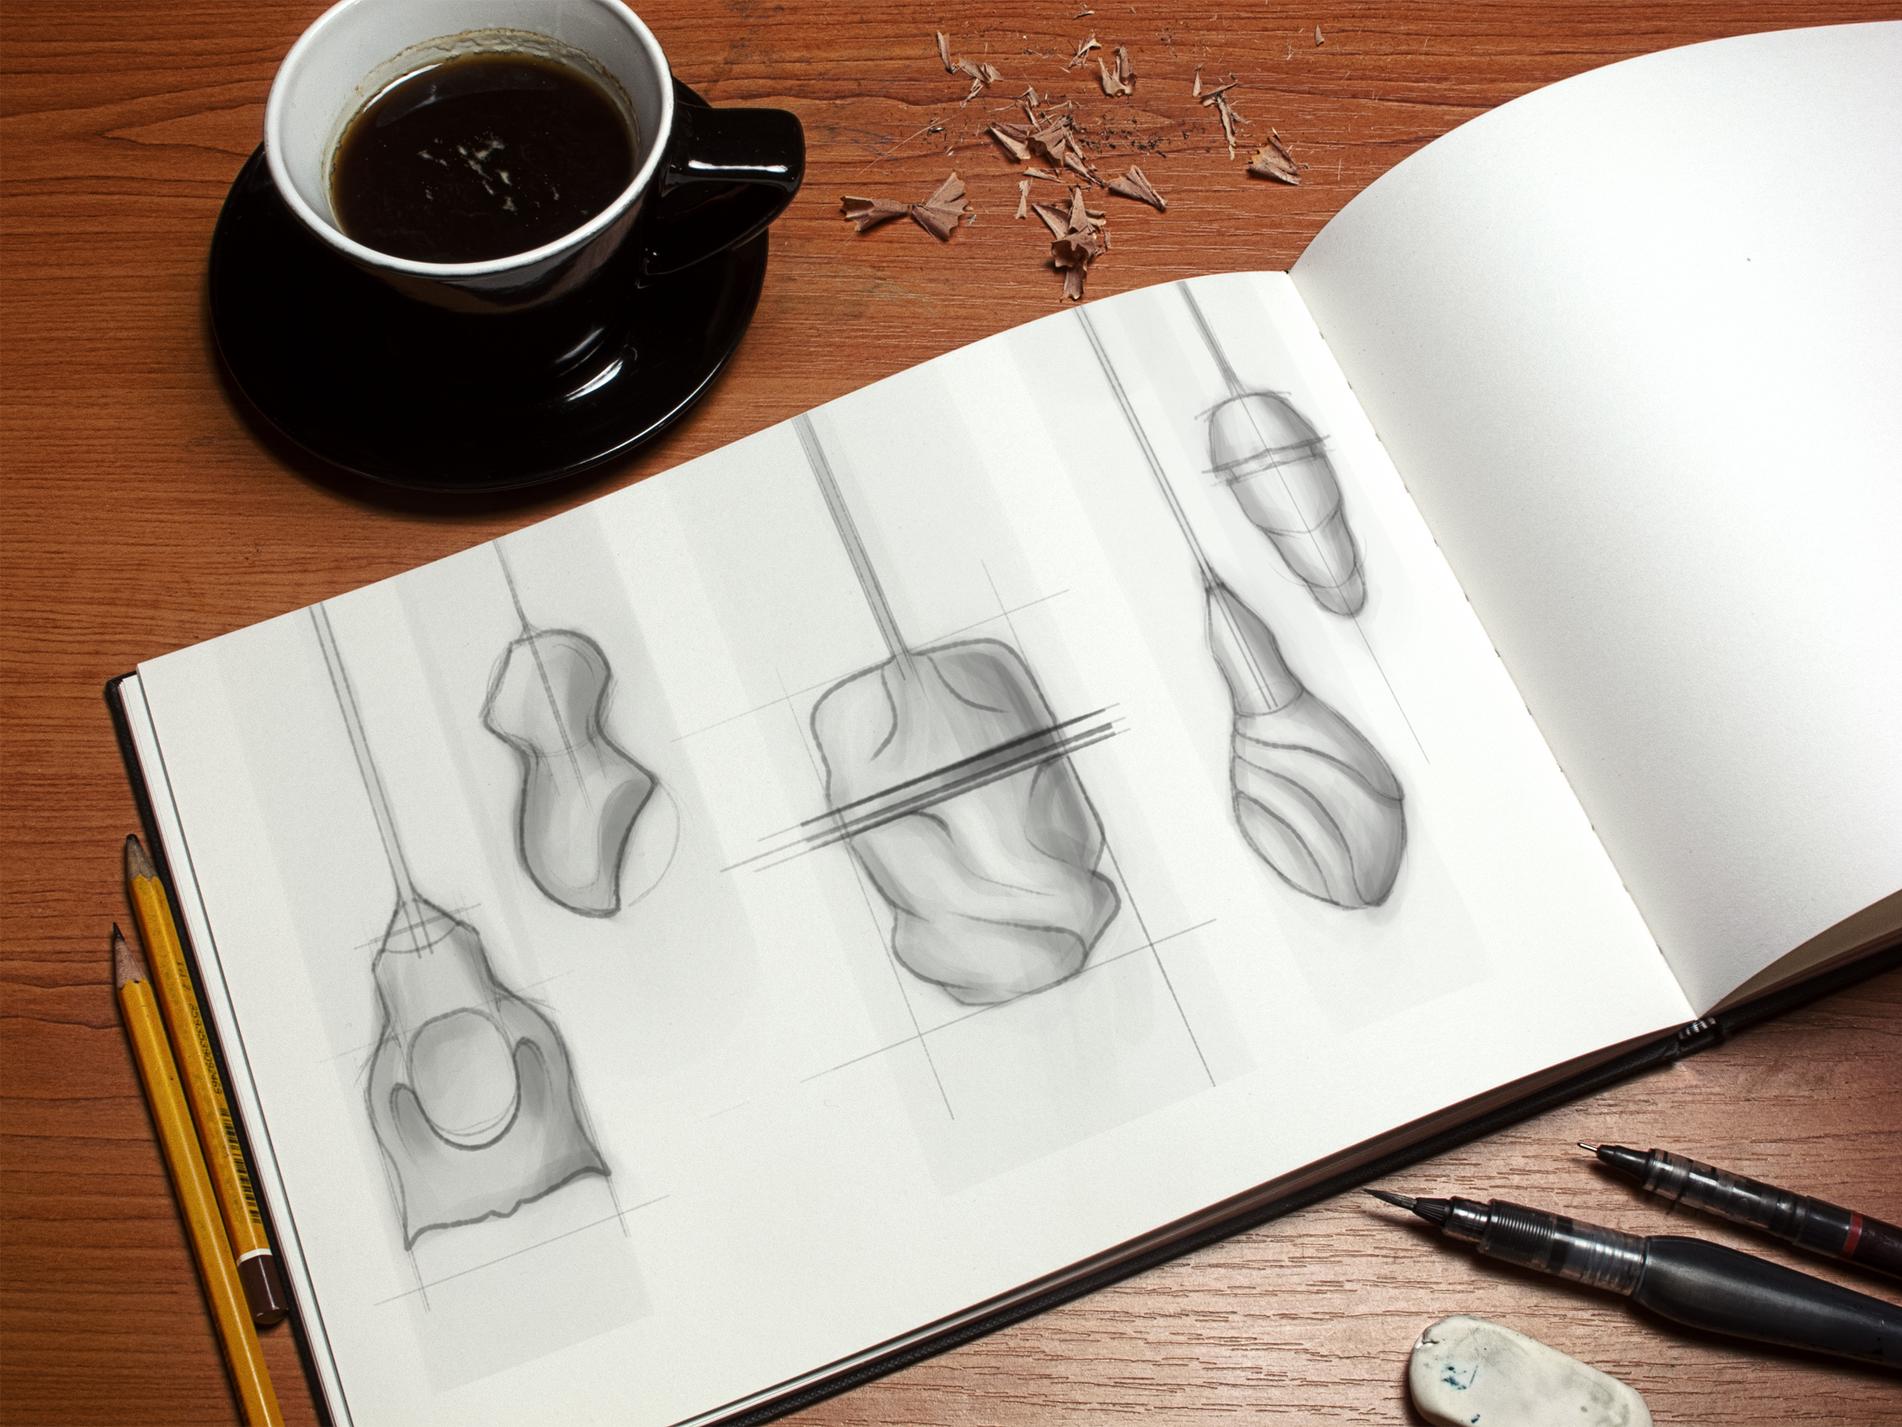 Pendant Light: Sketches